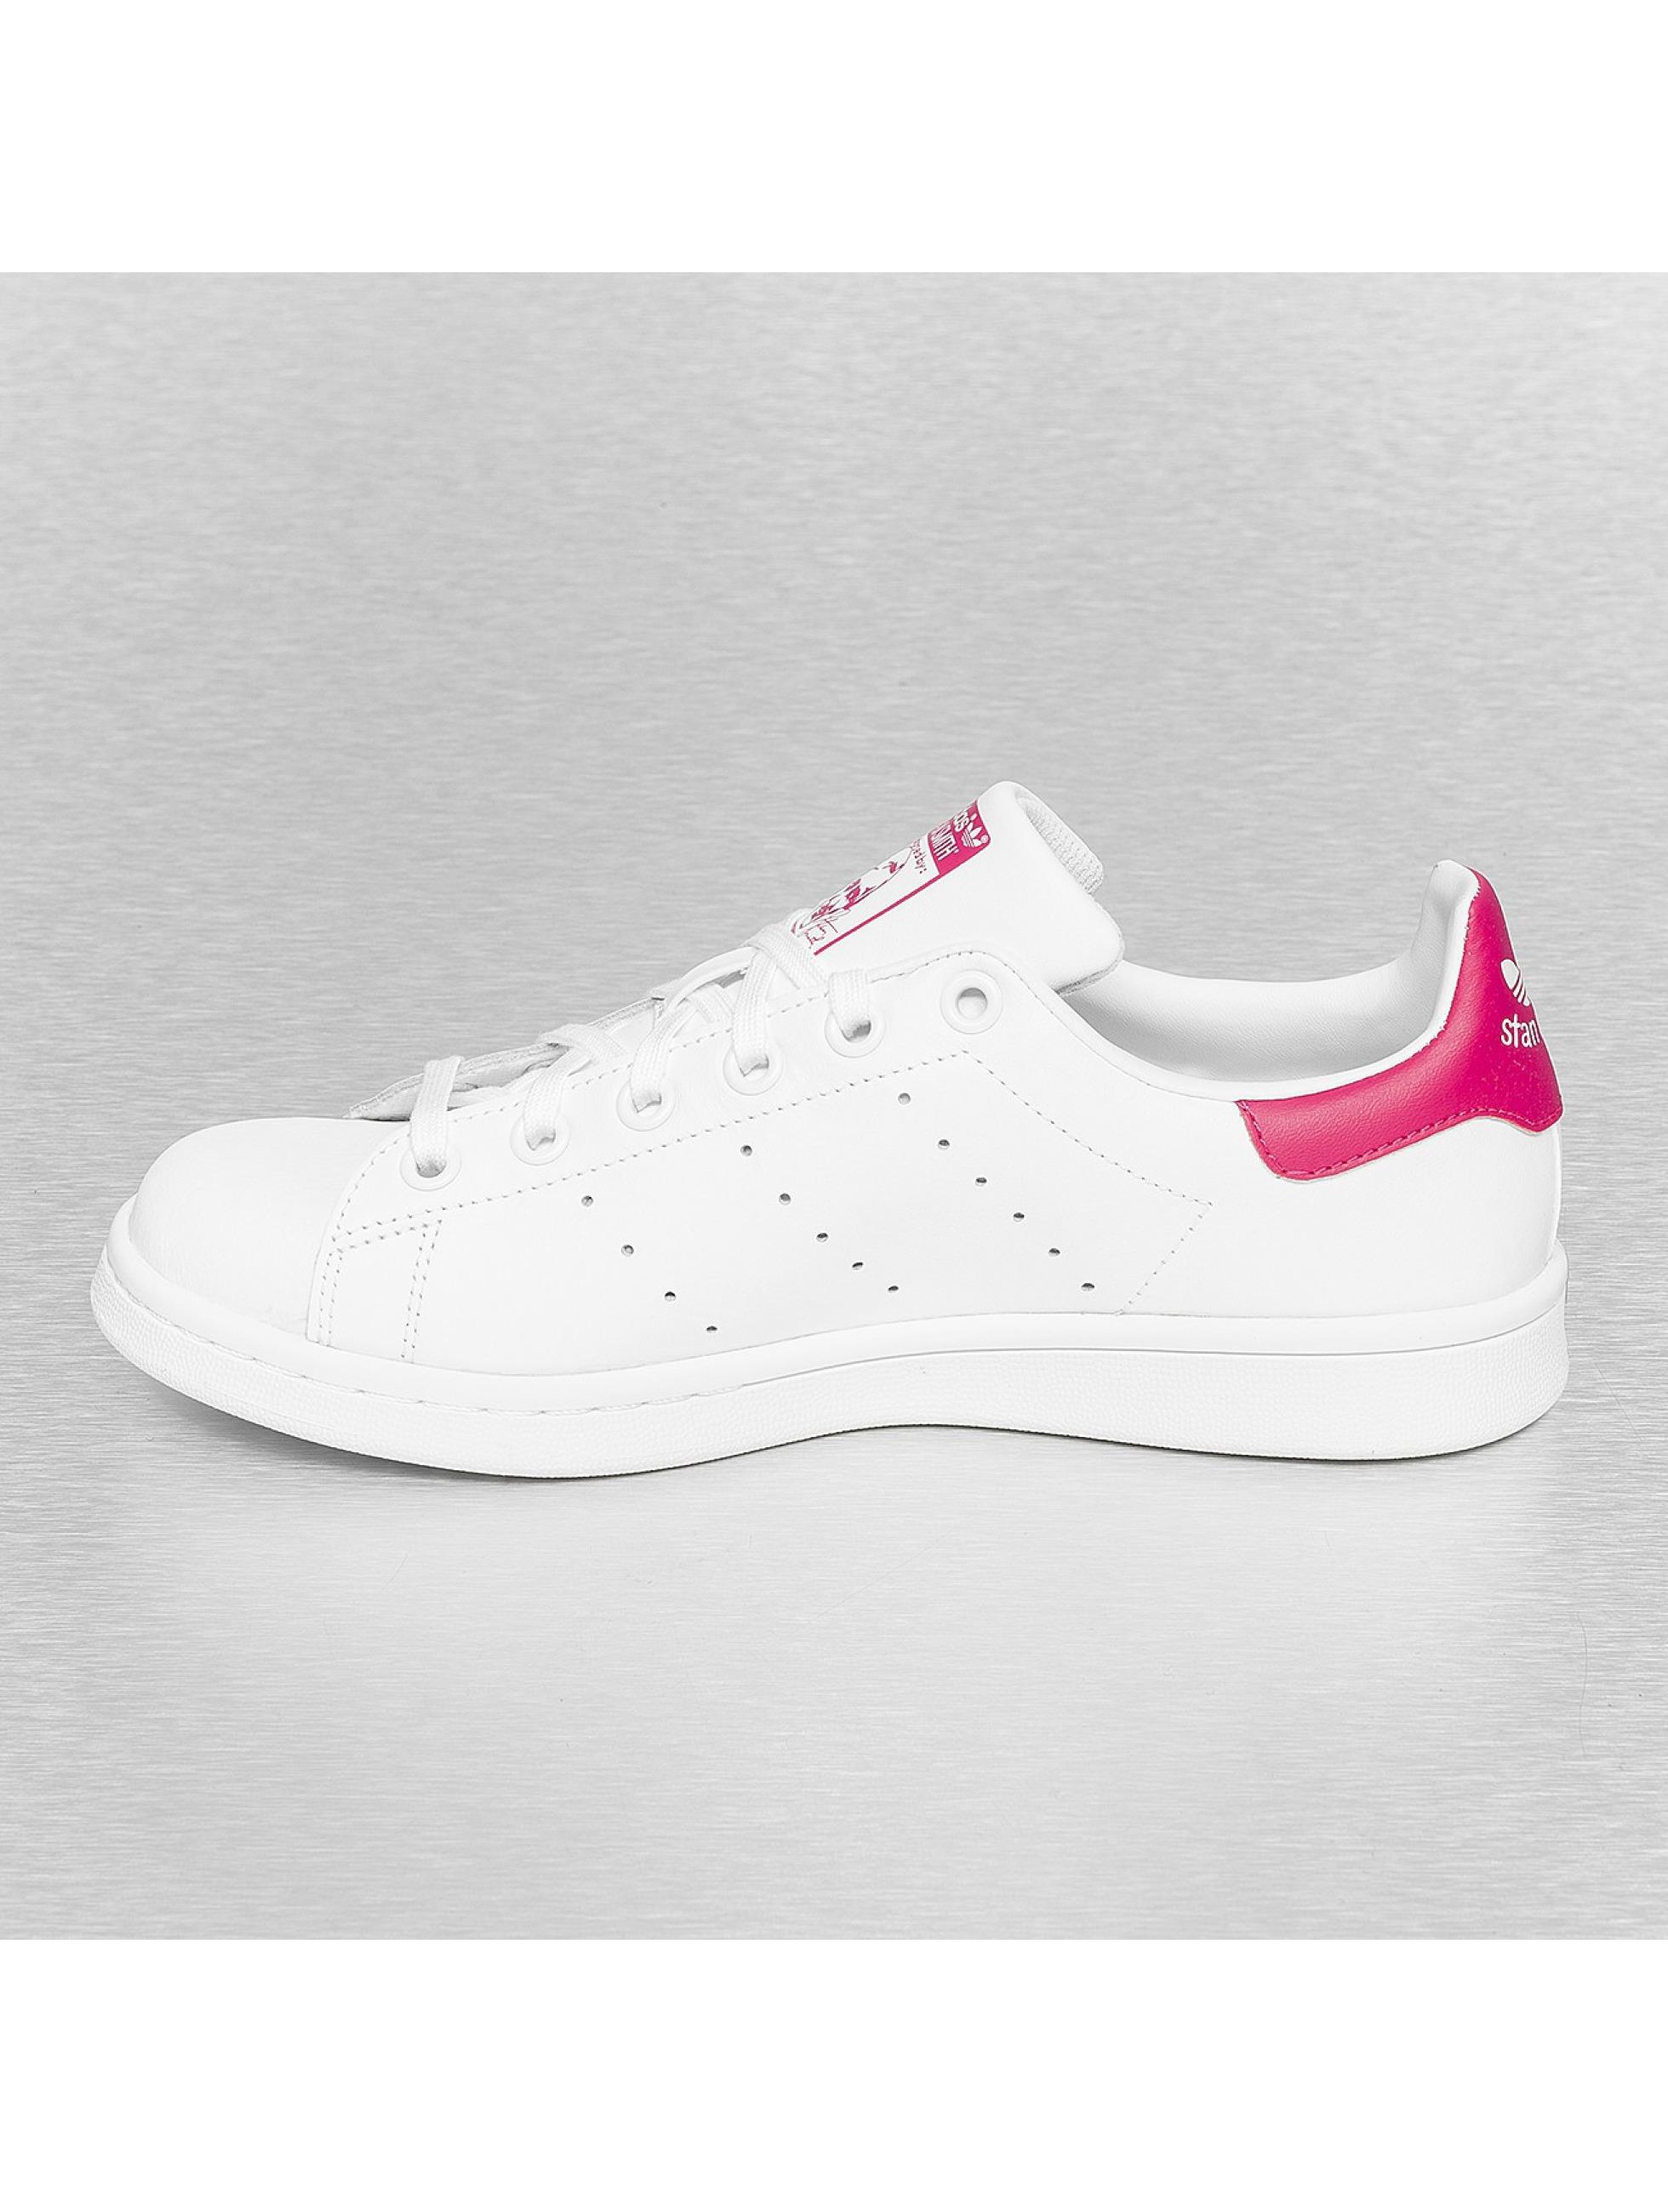 adidas stan smith blanc femme baskets adidas acheter pas cher chaussures 187035. Black Bedroom Furniture Sets. Home Design Ideas